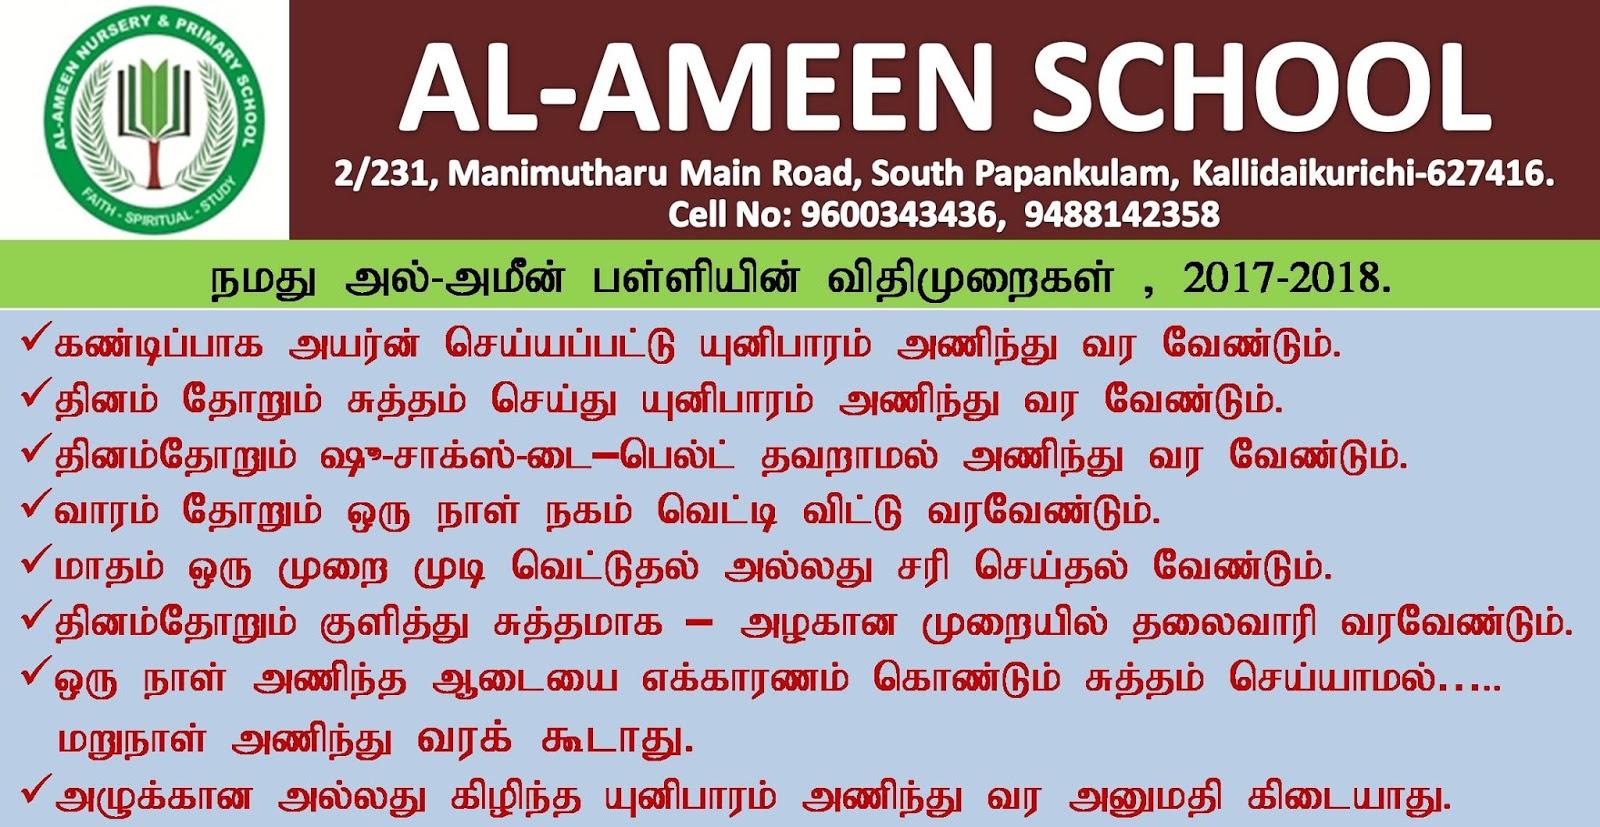 Al ameen school alameen schoolkic 83400 pm aiddatafo Image collections